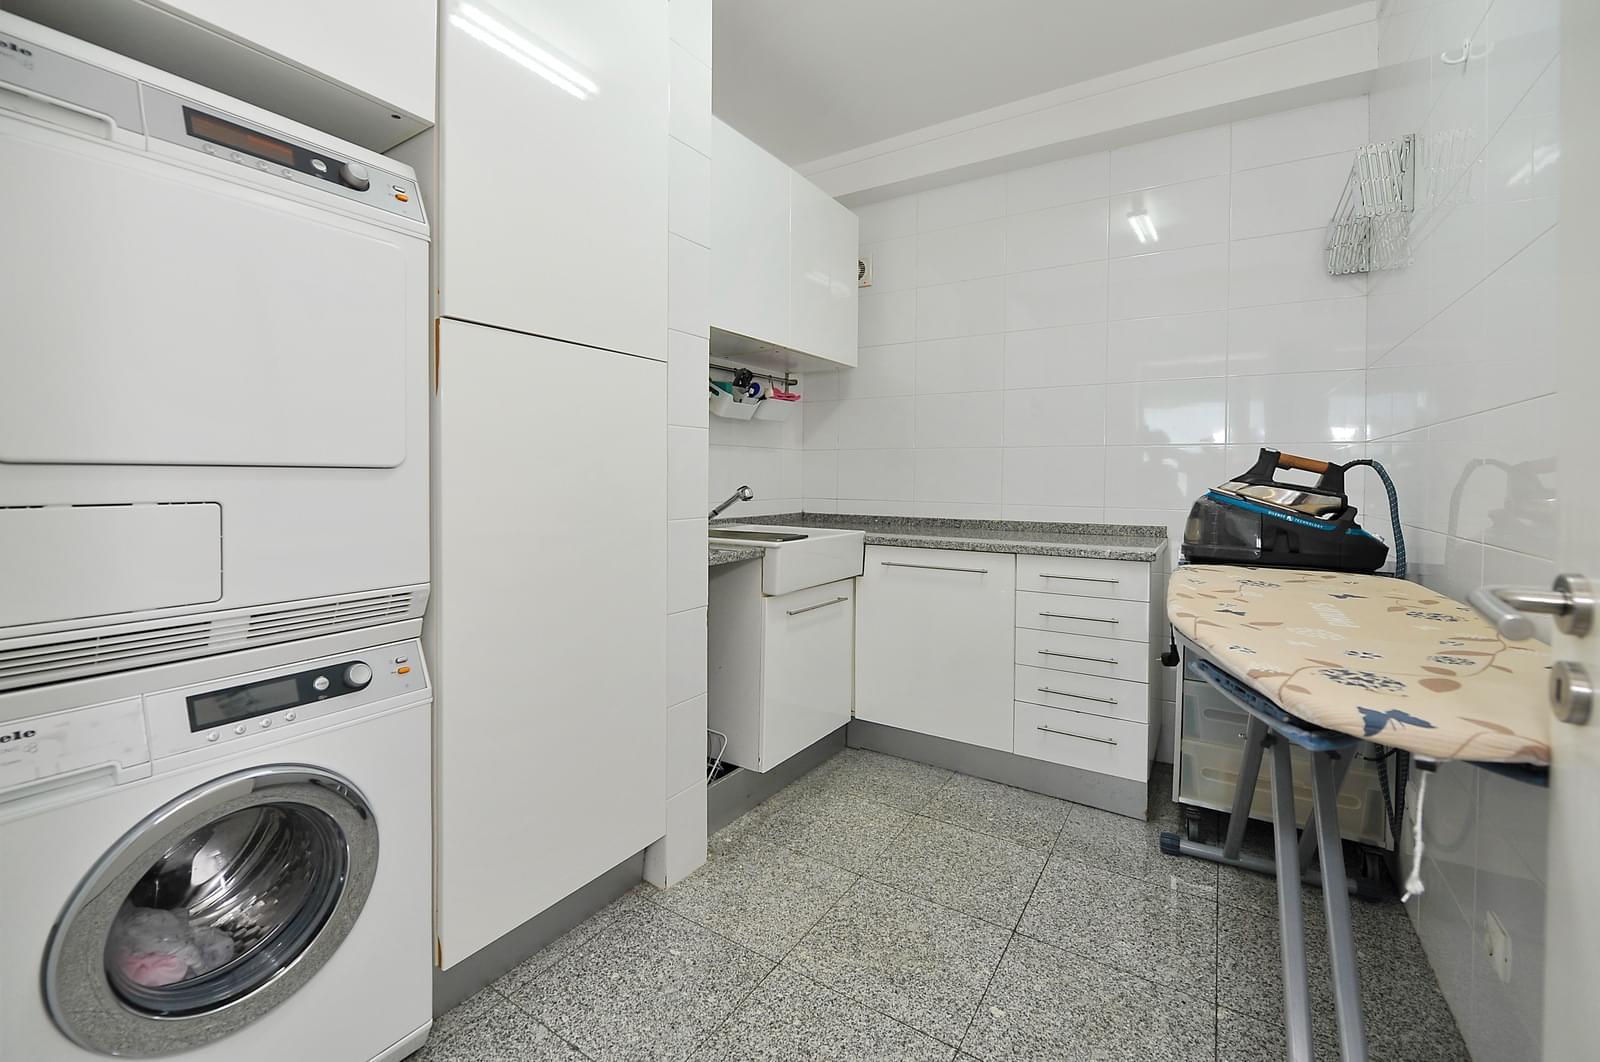 pf16896-apartamento-t4-2-oeiras-83c81a49-952a-47f7-94a7-6fb722381ed1